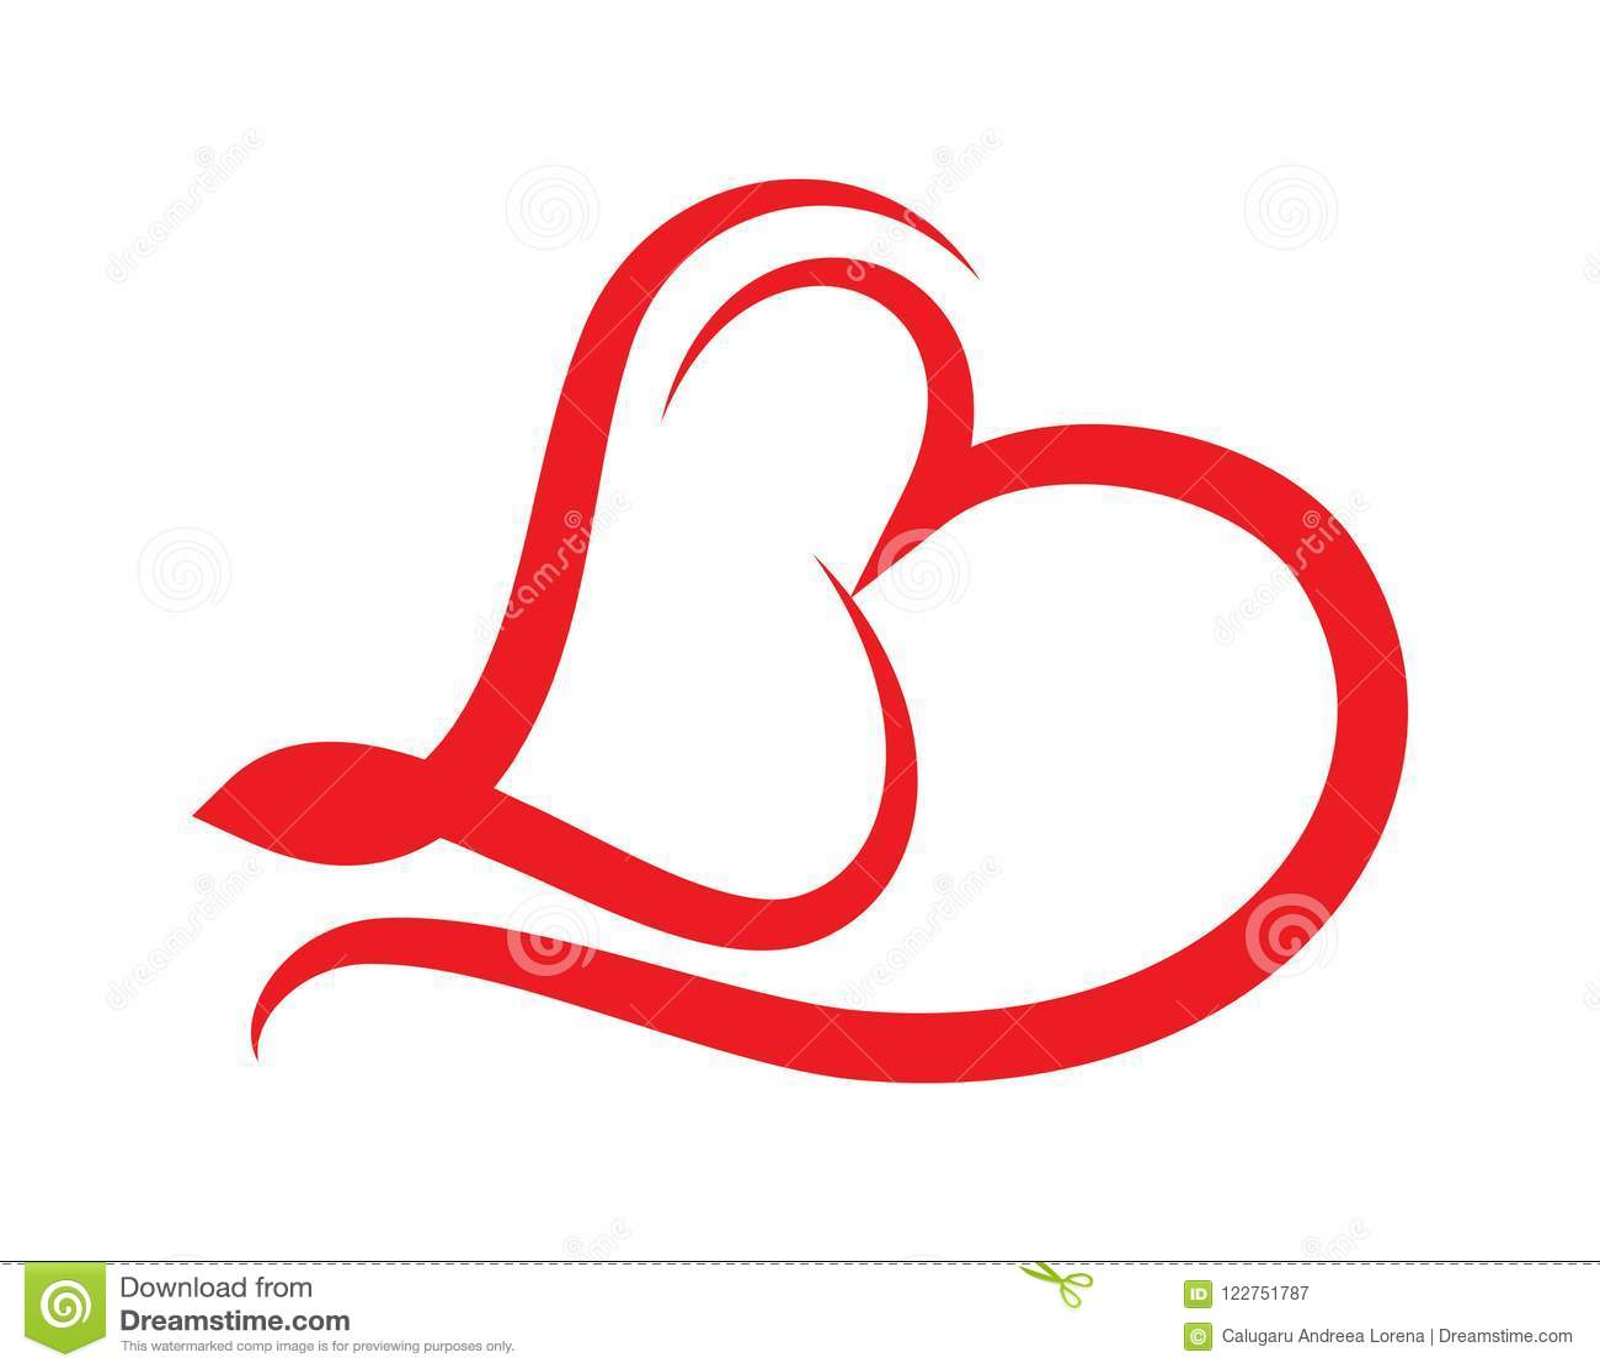 Valentine Alphabet Letter Template on valentine dance letters, valentine newspaper template, heart shaped letters, valentine animals, valentine masquerade, valentine bubble letters, valentine coloring letters, valentine love letters, valentine abc's, valentine for him love poems, valentine letter format, valentine ocean, valentine clip art, valentine envelope, valentine's letters, valentine letters for him, valentine day romantic poems, valentine word letters, valentine letter n,